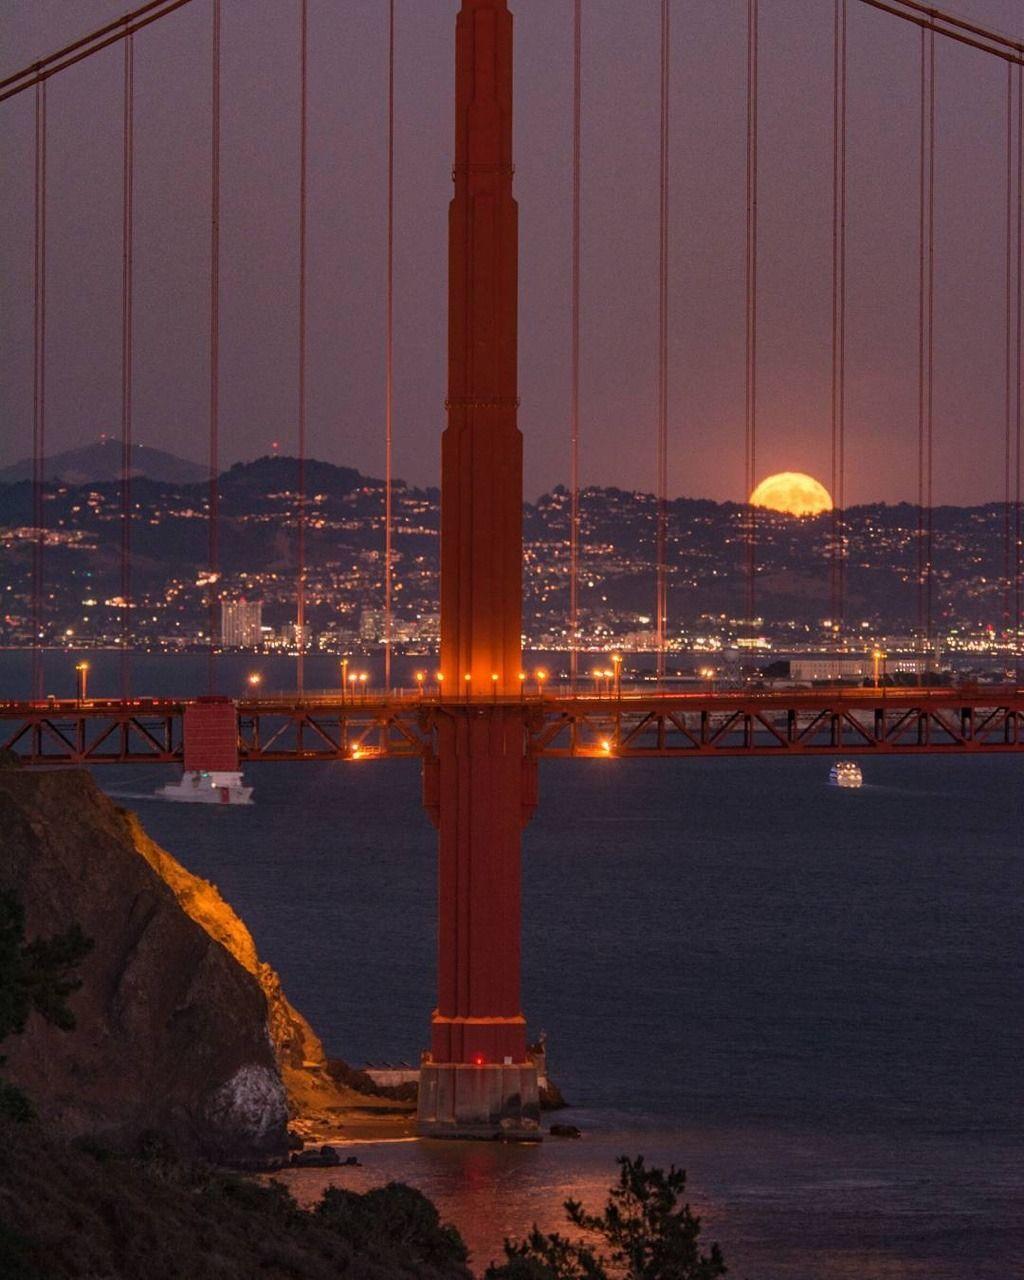 Harvest Moon In San Francisco By Lifeonclaude9 Sanfrancisco Sf Bayarea Alwayssf Goldengatebridge Living In San Francisco Golden Gate Bridge Golden Gate